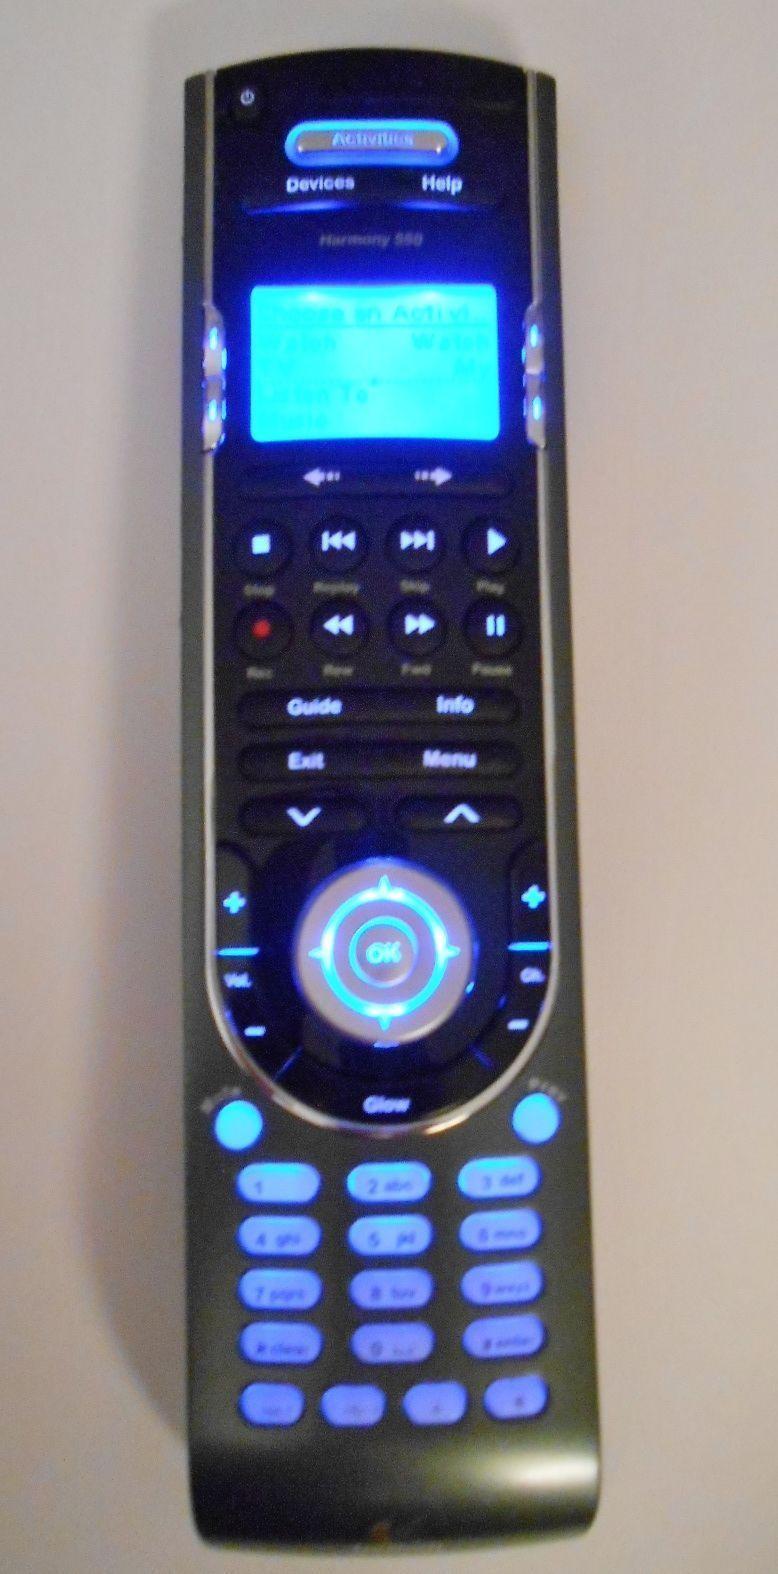 logitech harmony 550 remote control universal home multi system rh unisquare com Logitech Harmony 550 Programming Logitech Harmony 550 Programming